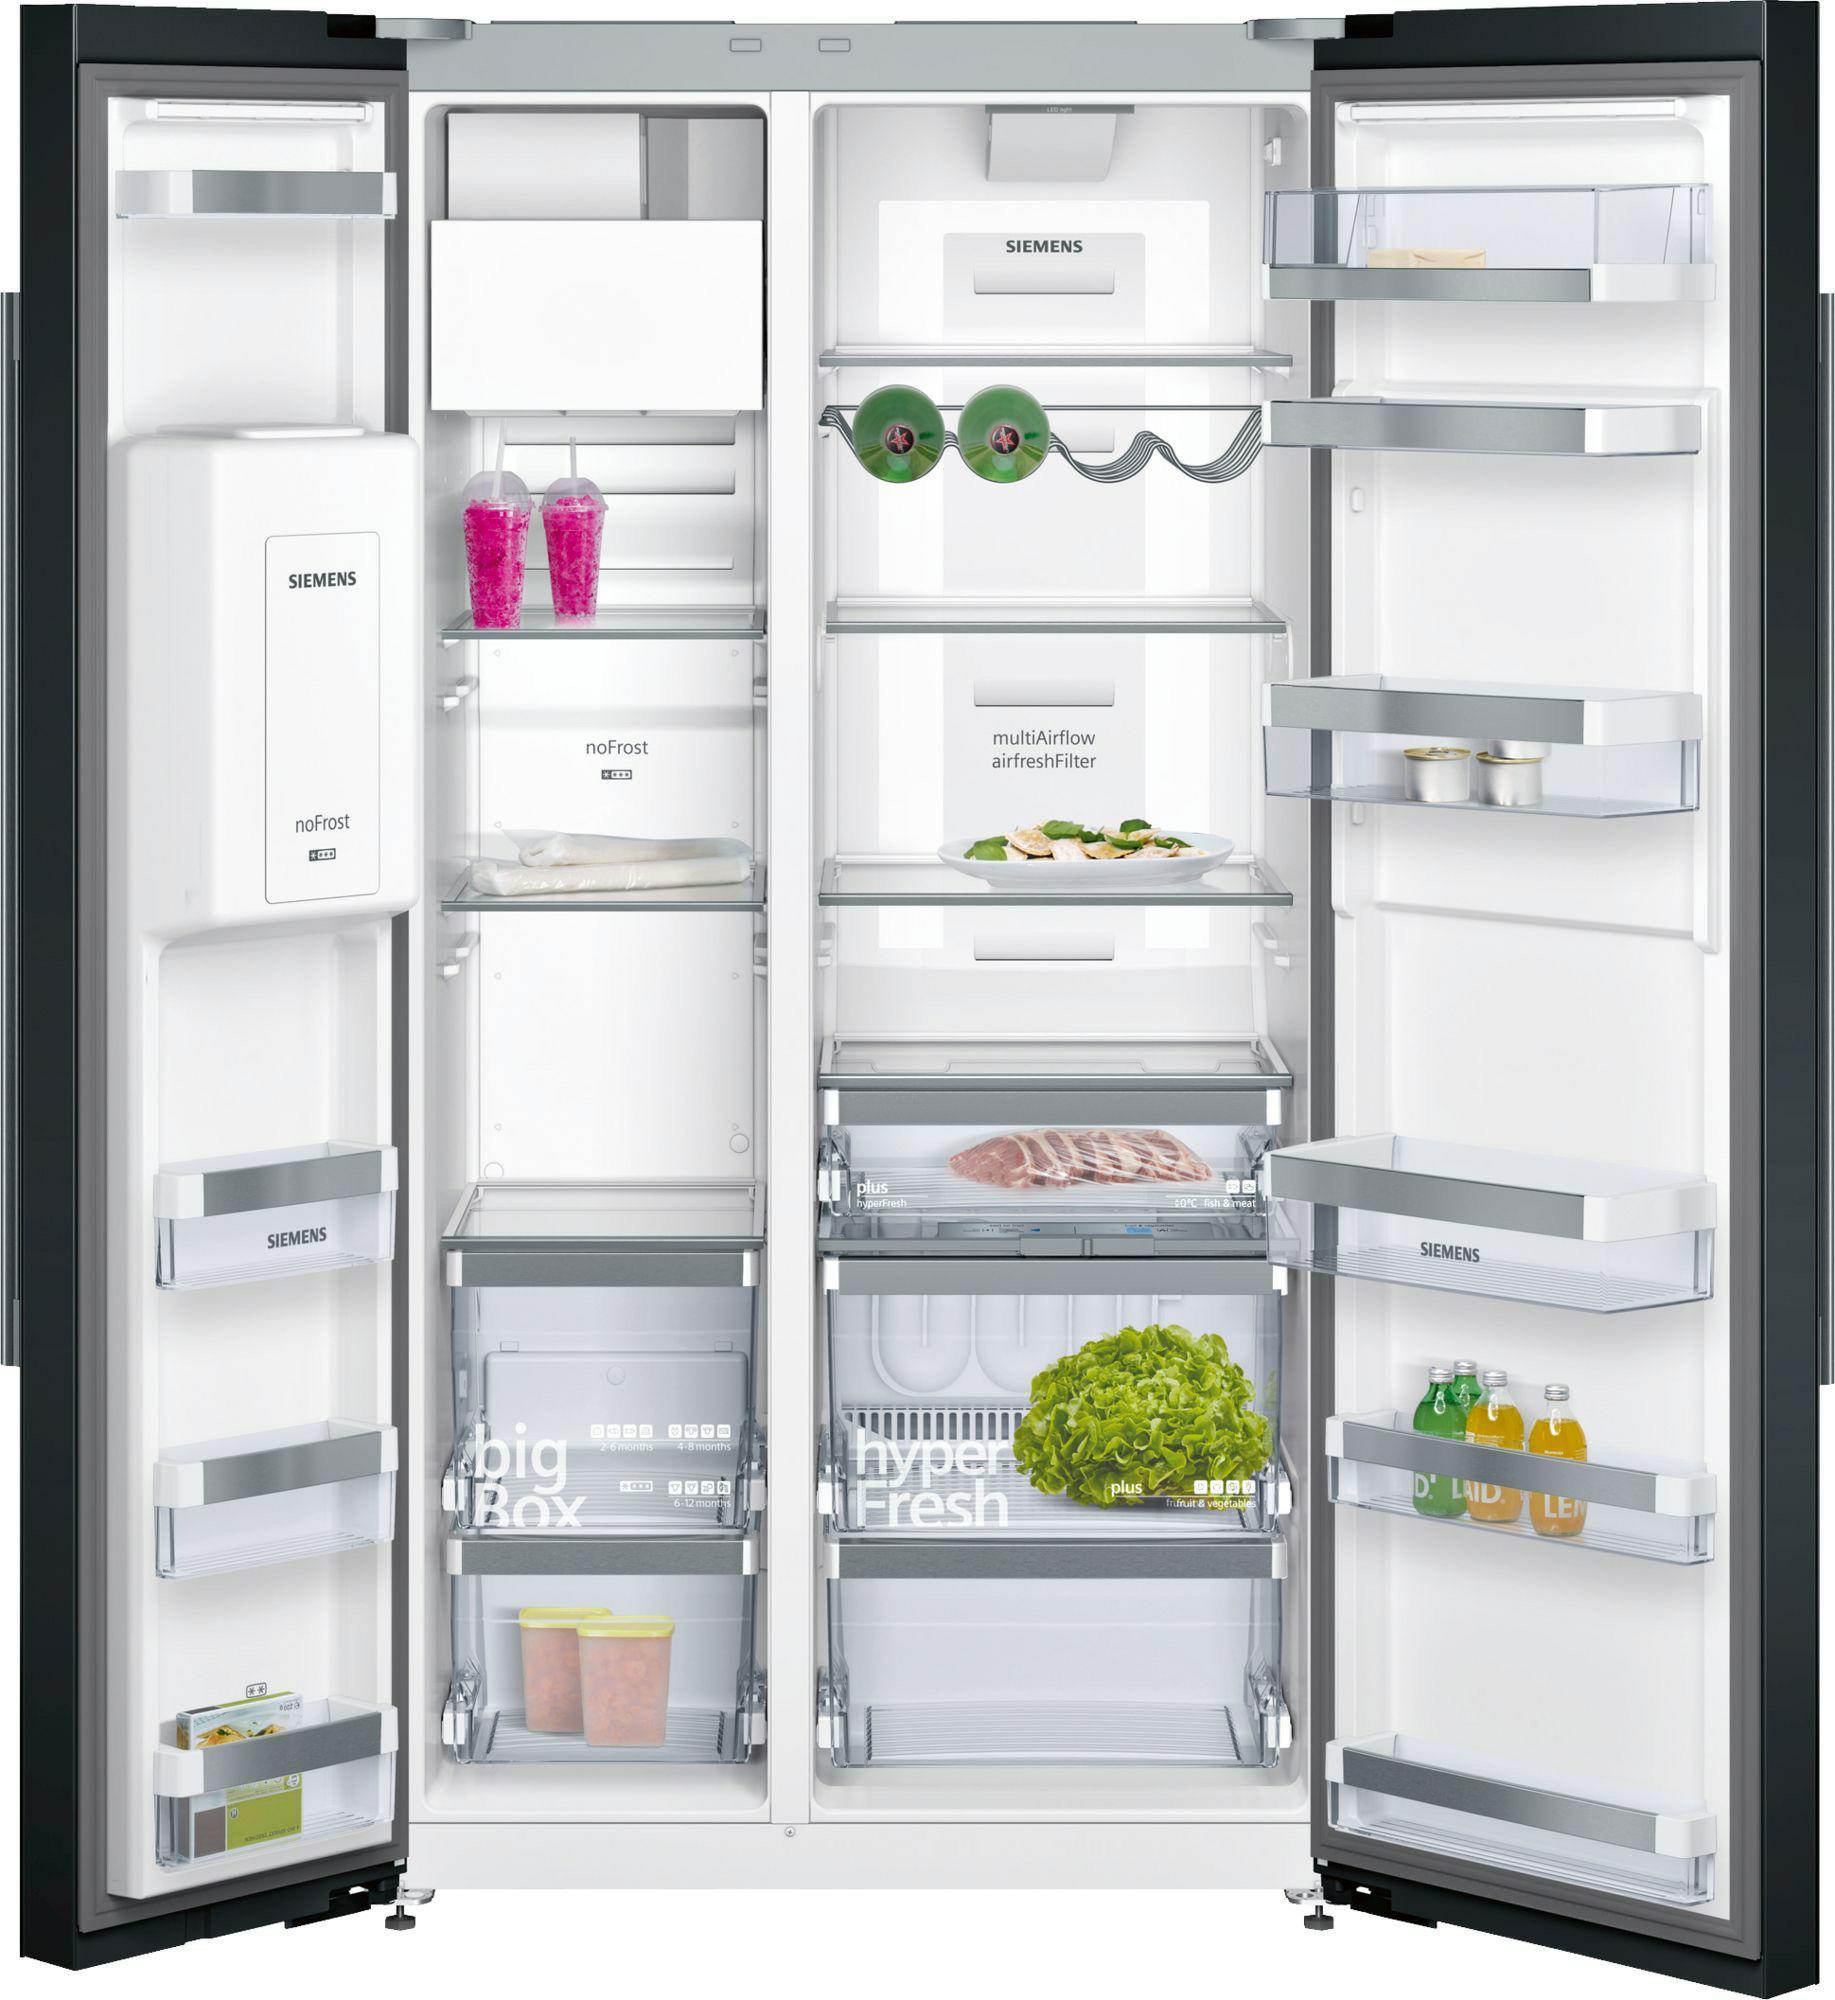 side-by-side koelkast Siemens KA92DSB30 side-by-side koelkast vrijstaand KA 92DSB30 KA 92 DSB 30